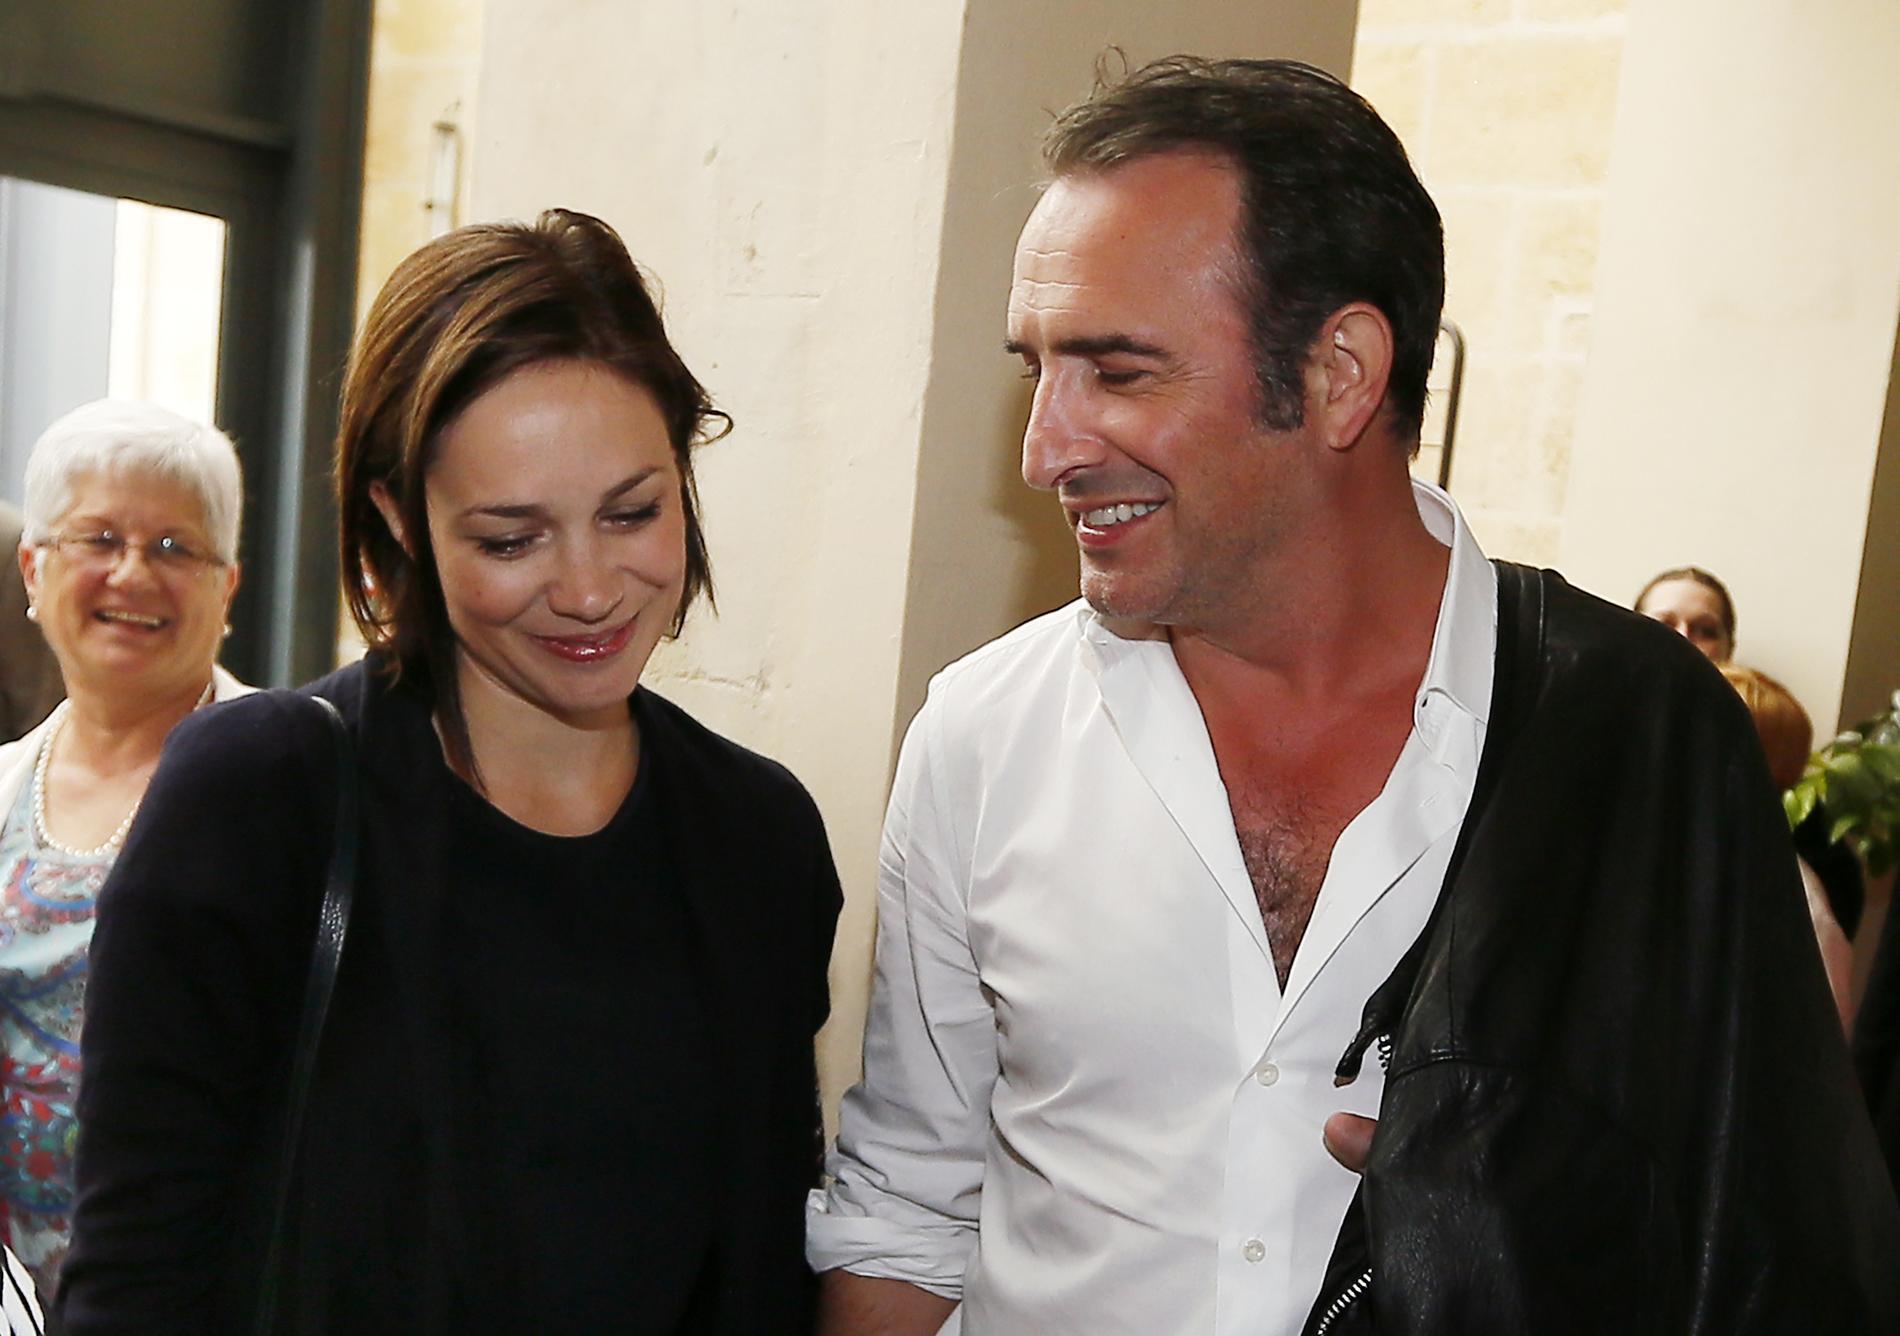 Jean dujardin et nathalie p chalat ils sont parents for Nathalie jean dujardin